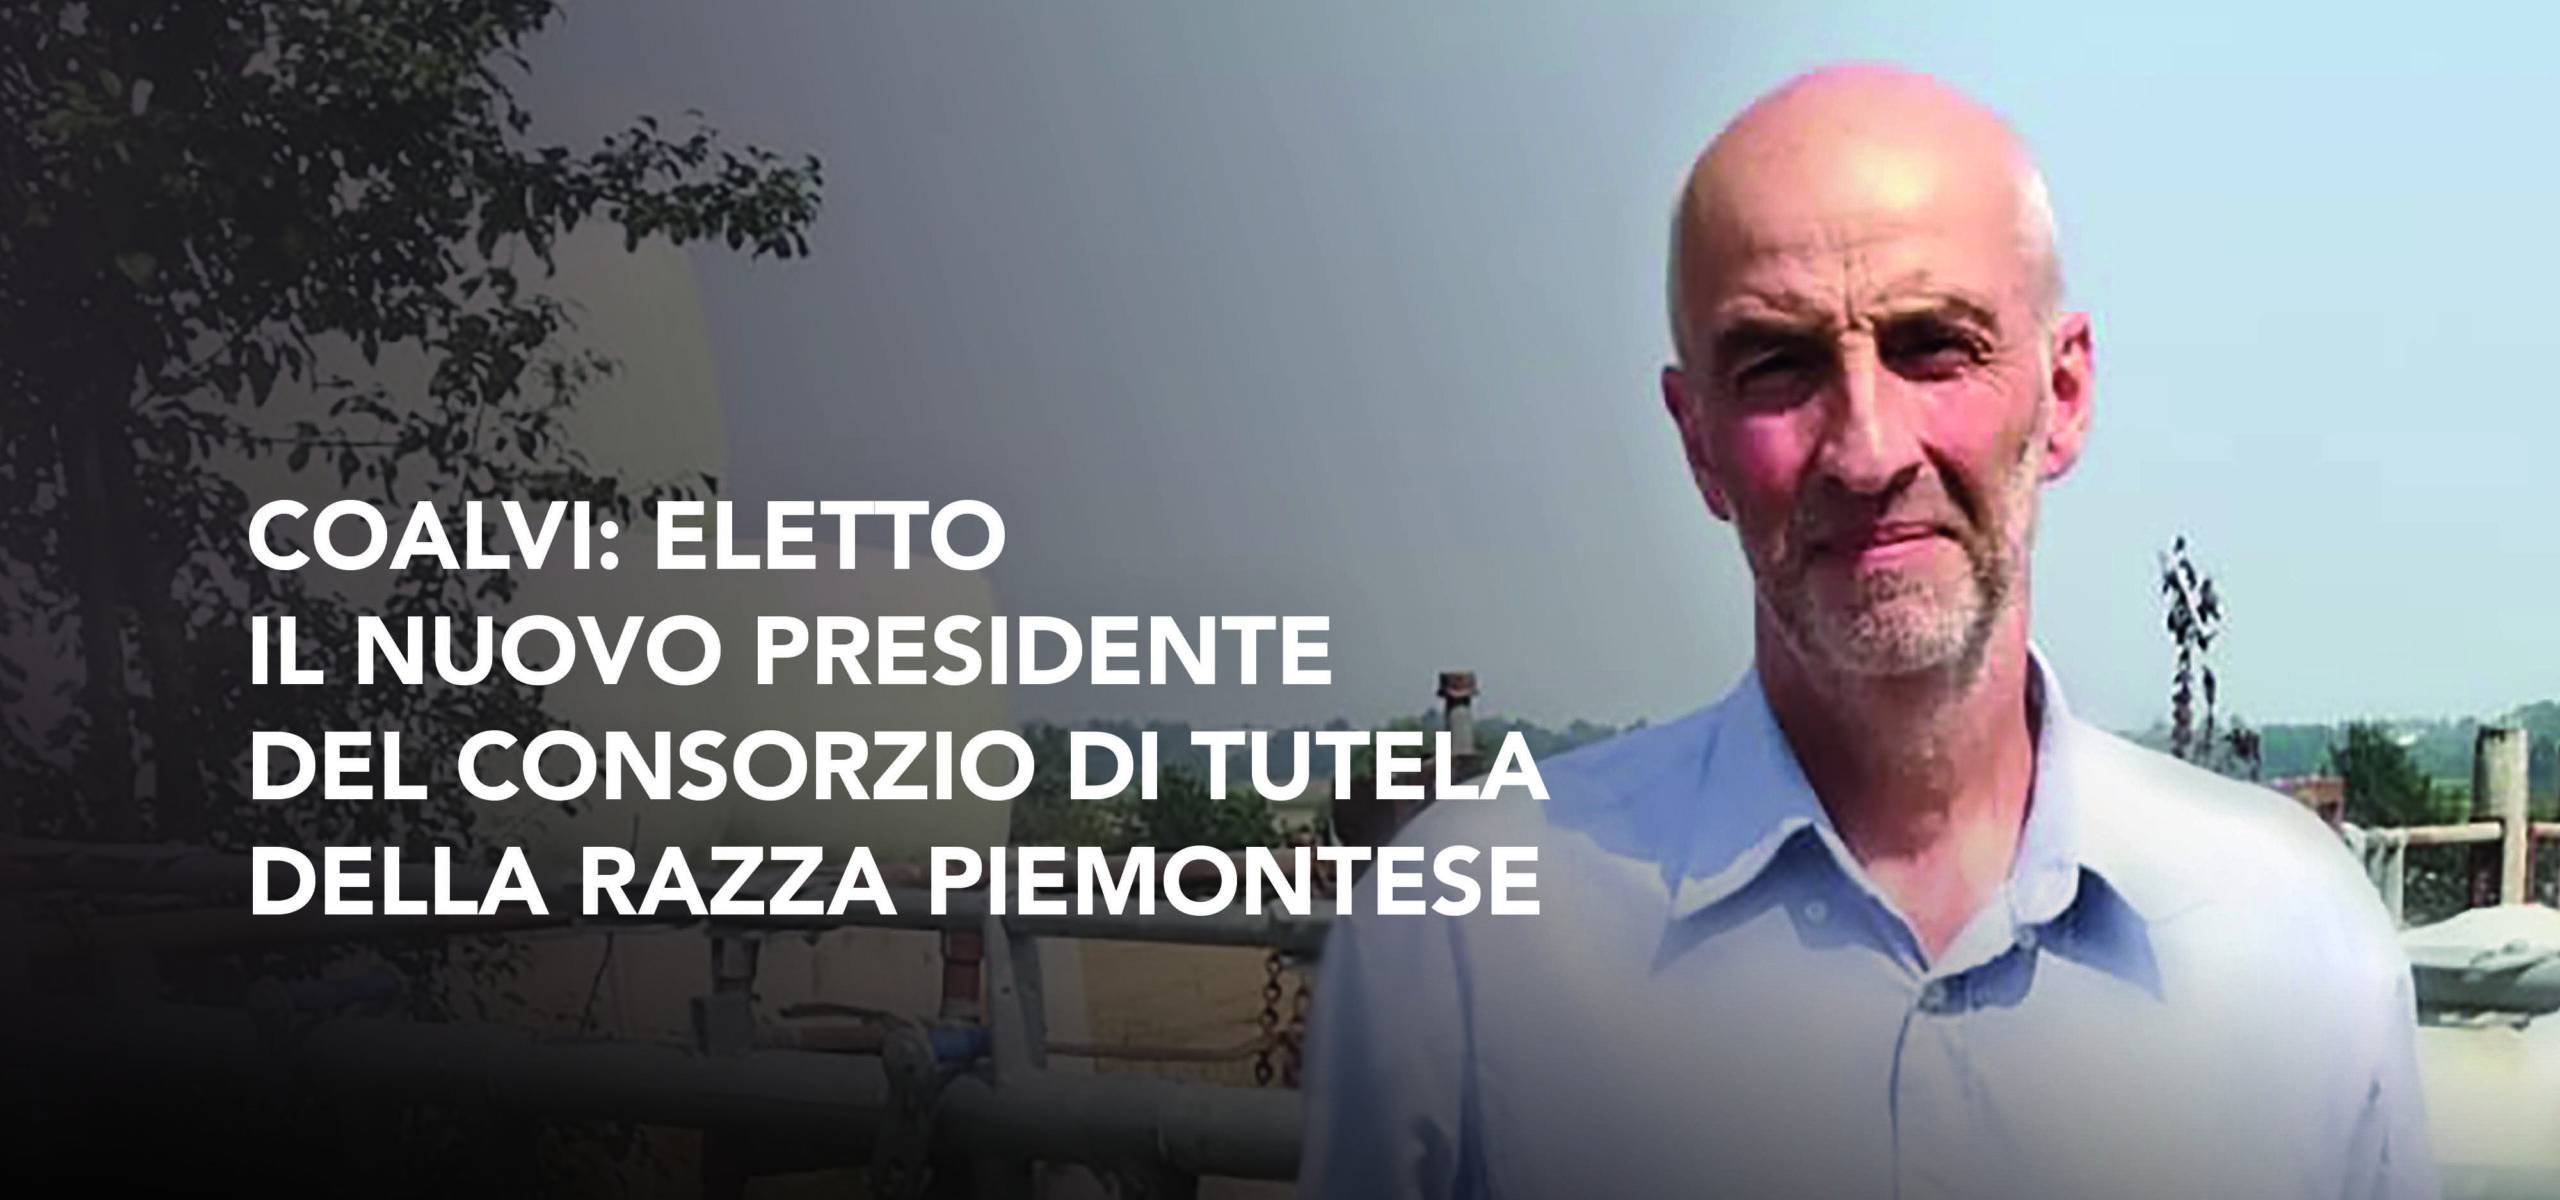 Guido Groppo